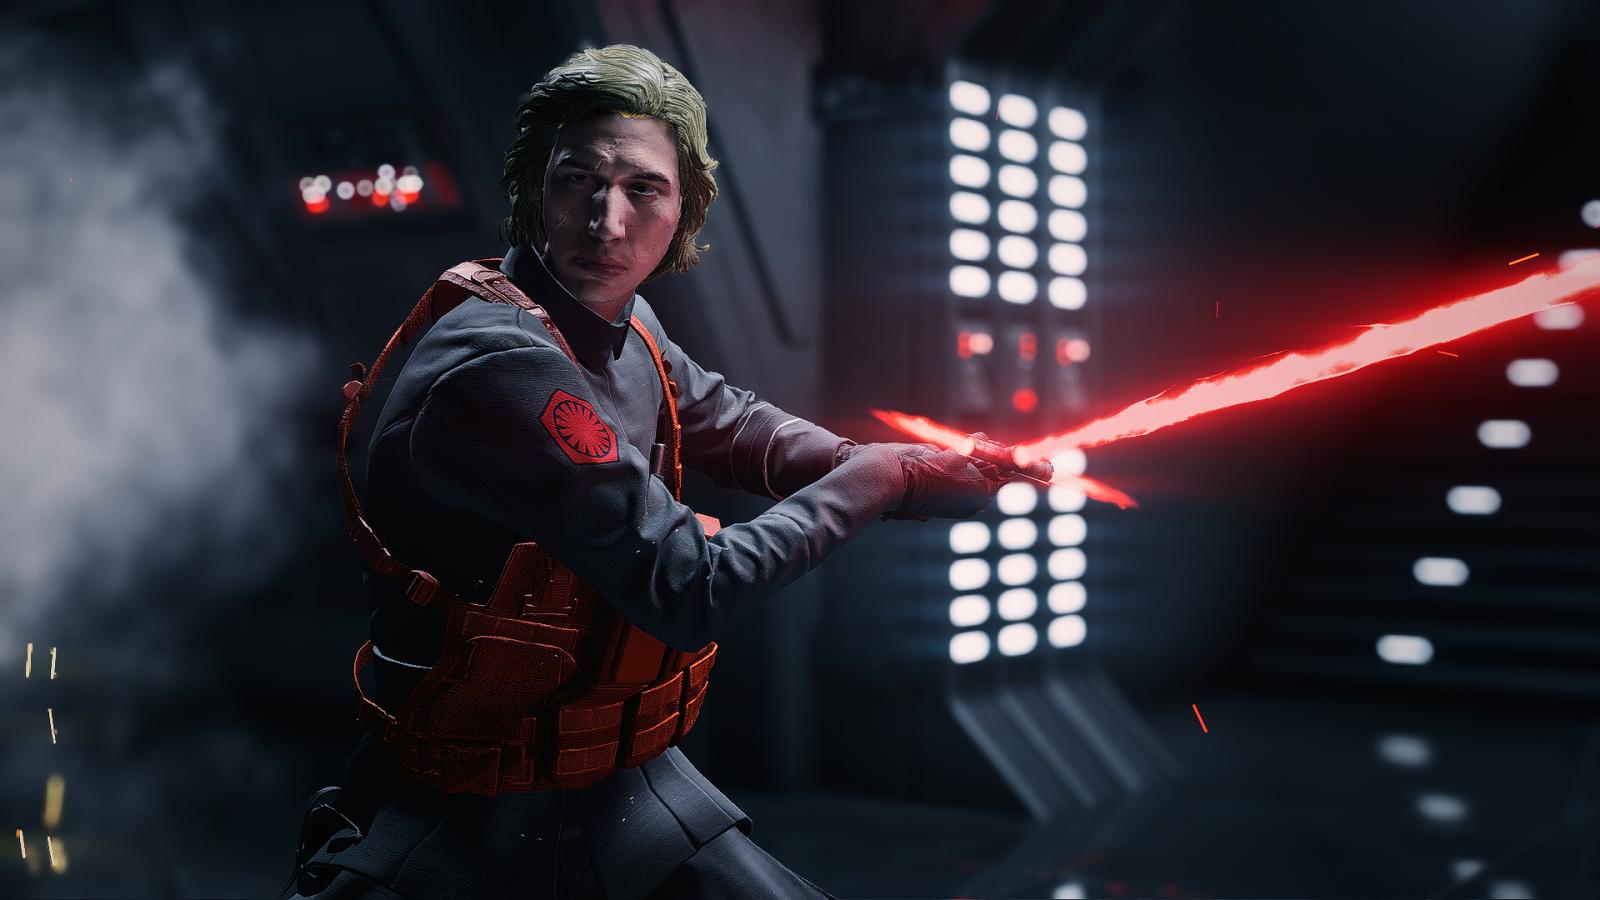 Pink Darth Vader is Now In Star Wars: Battlefront 2 Mod